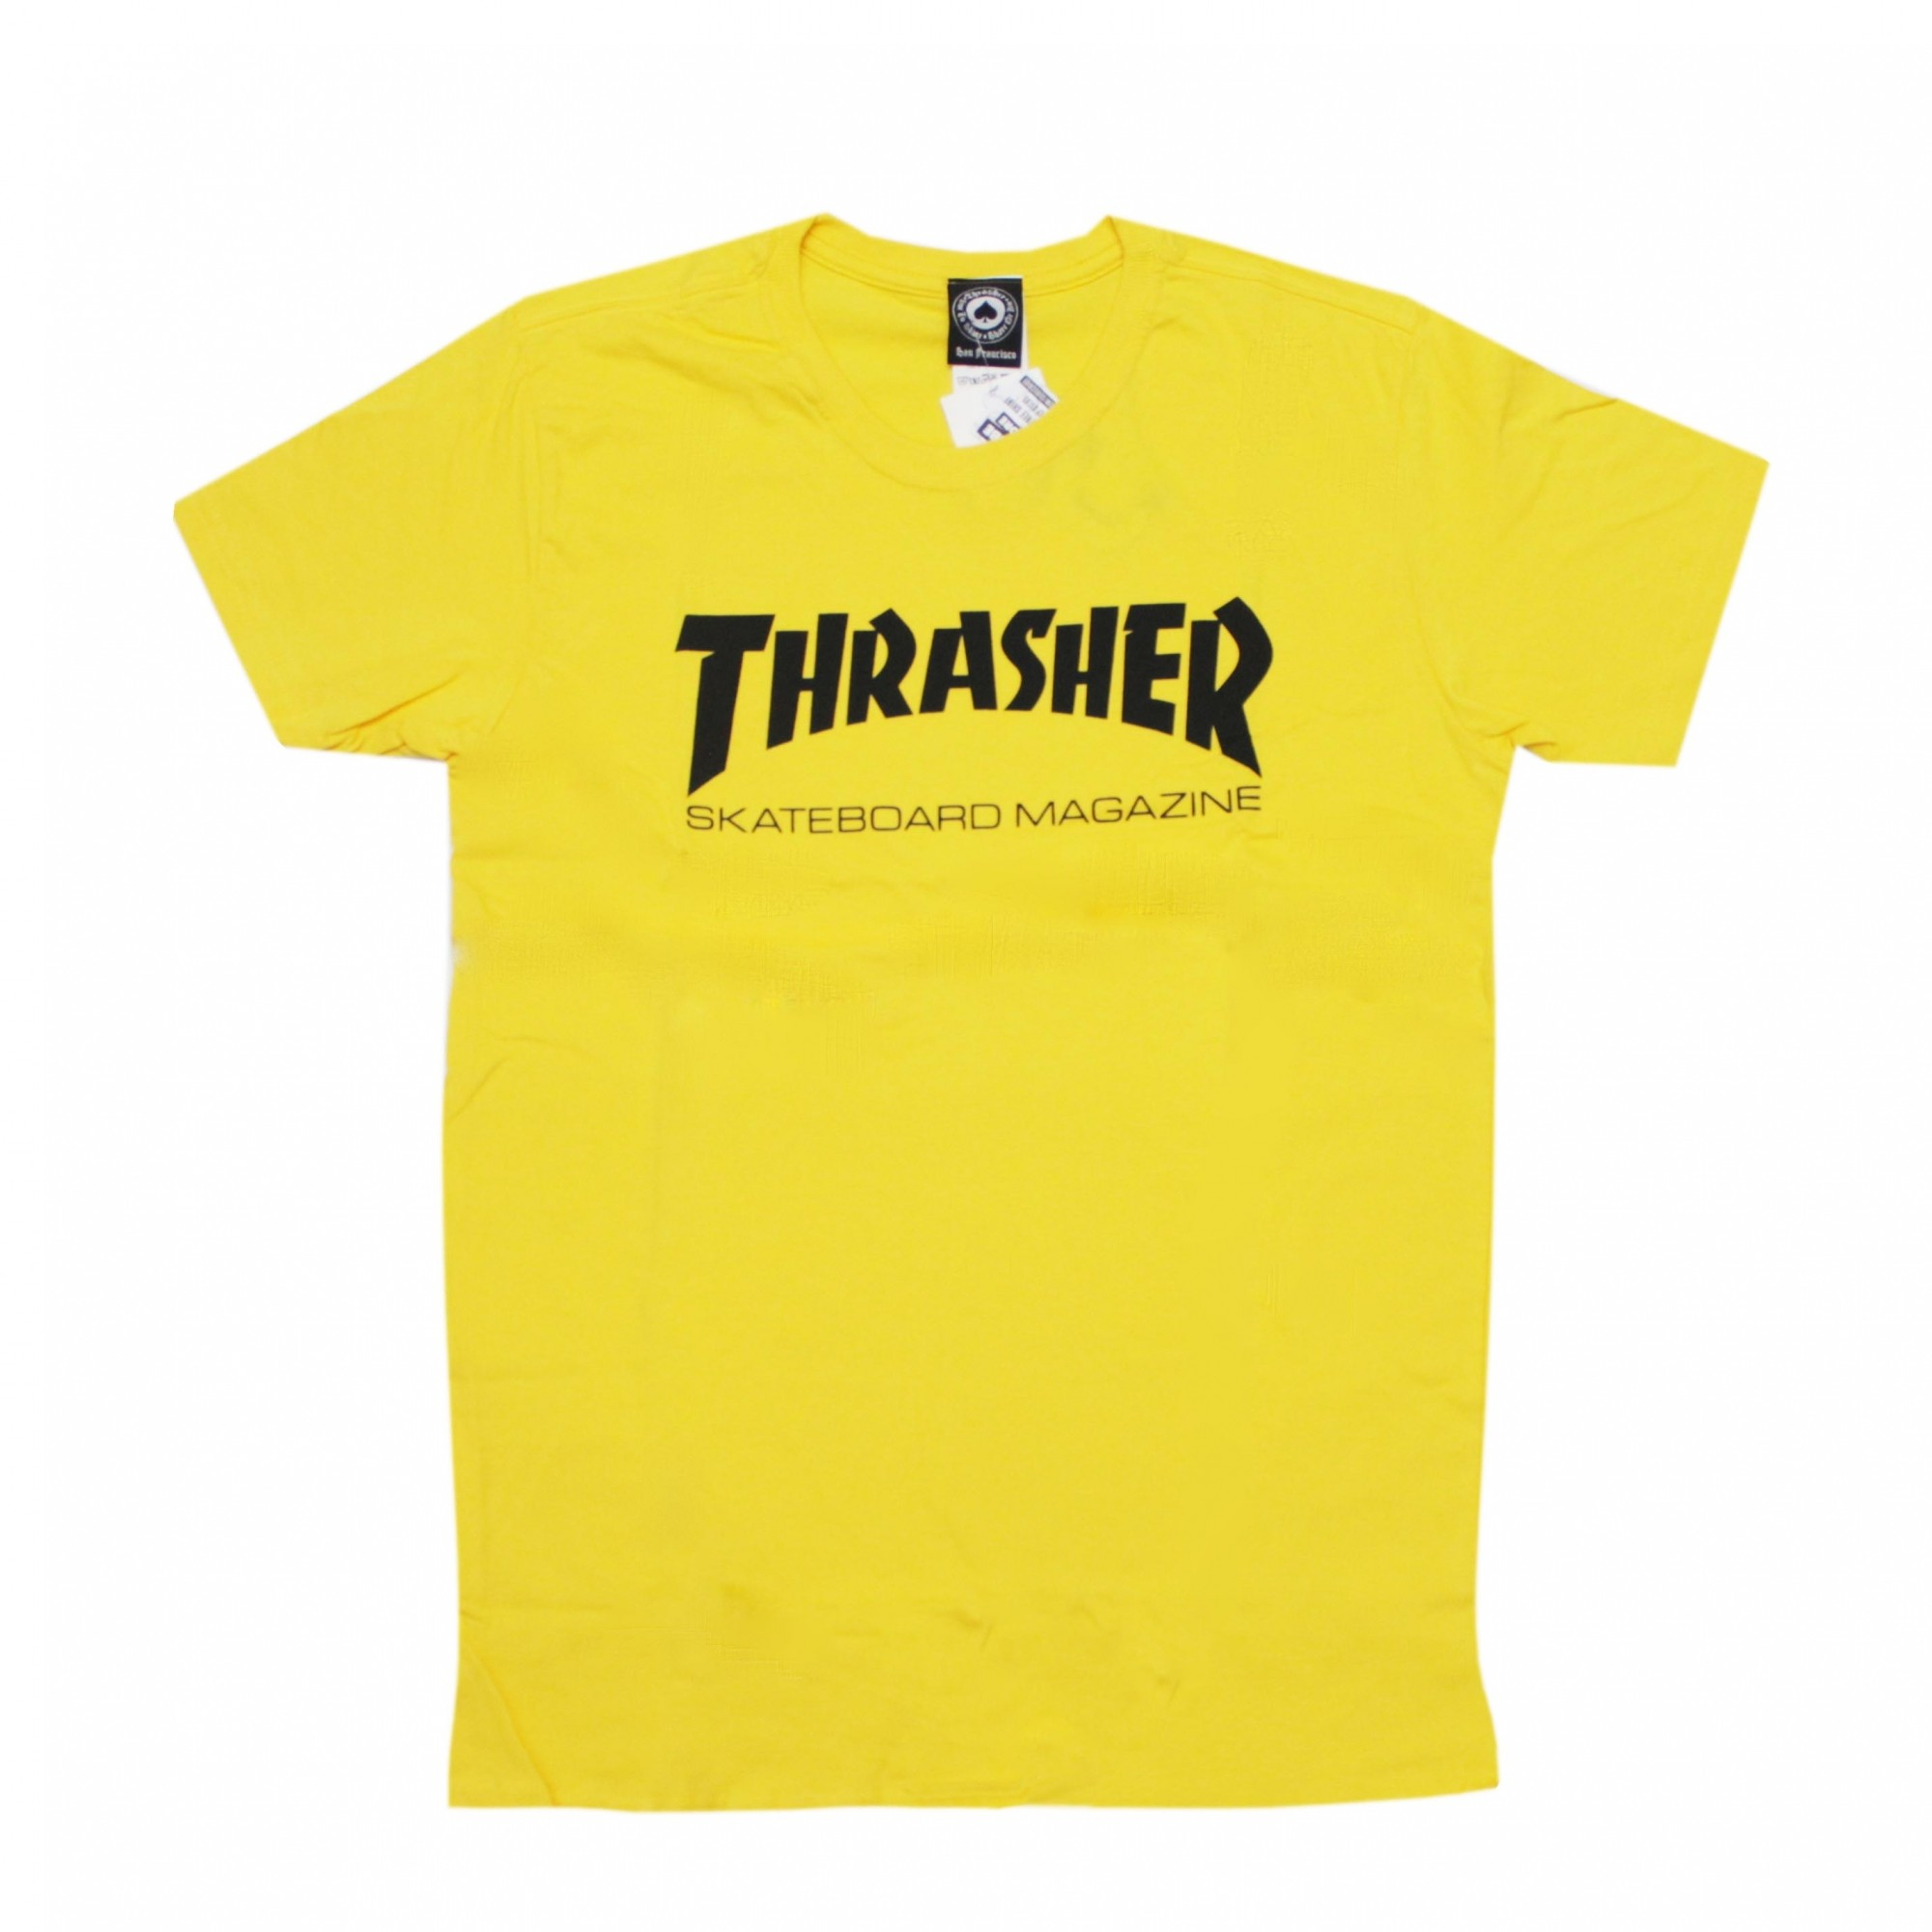 Camiseta Thrasher Magazine Skate Mag - Amarelo